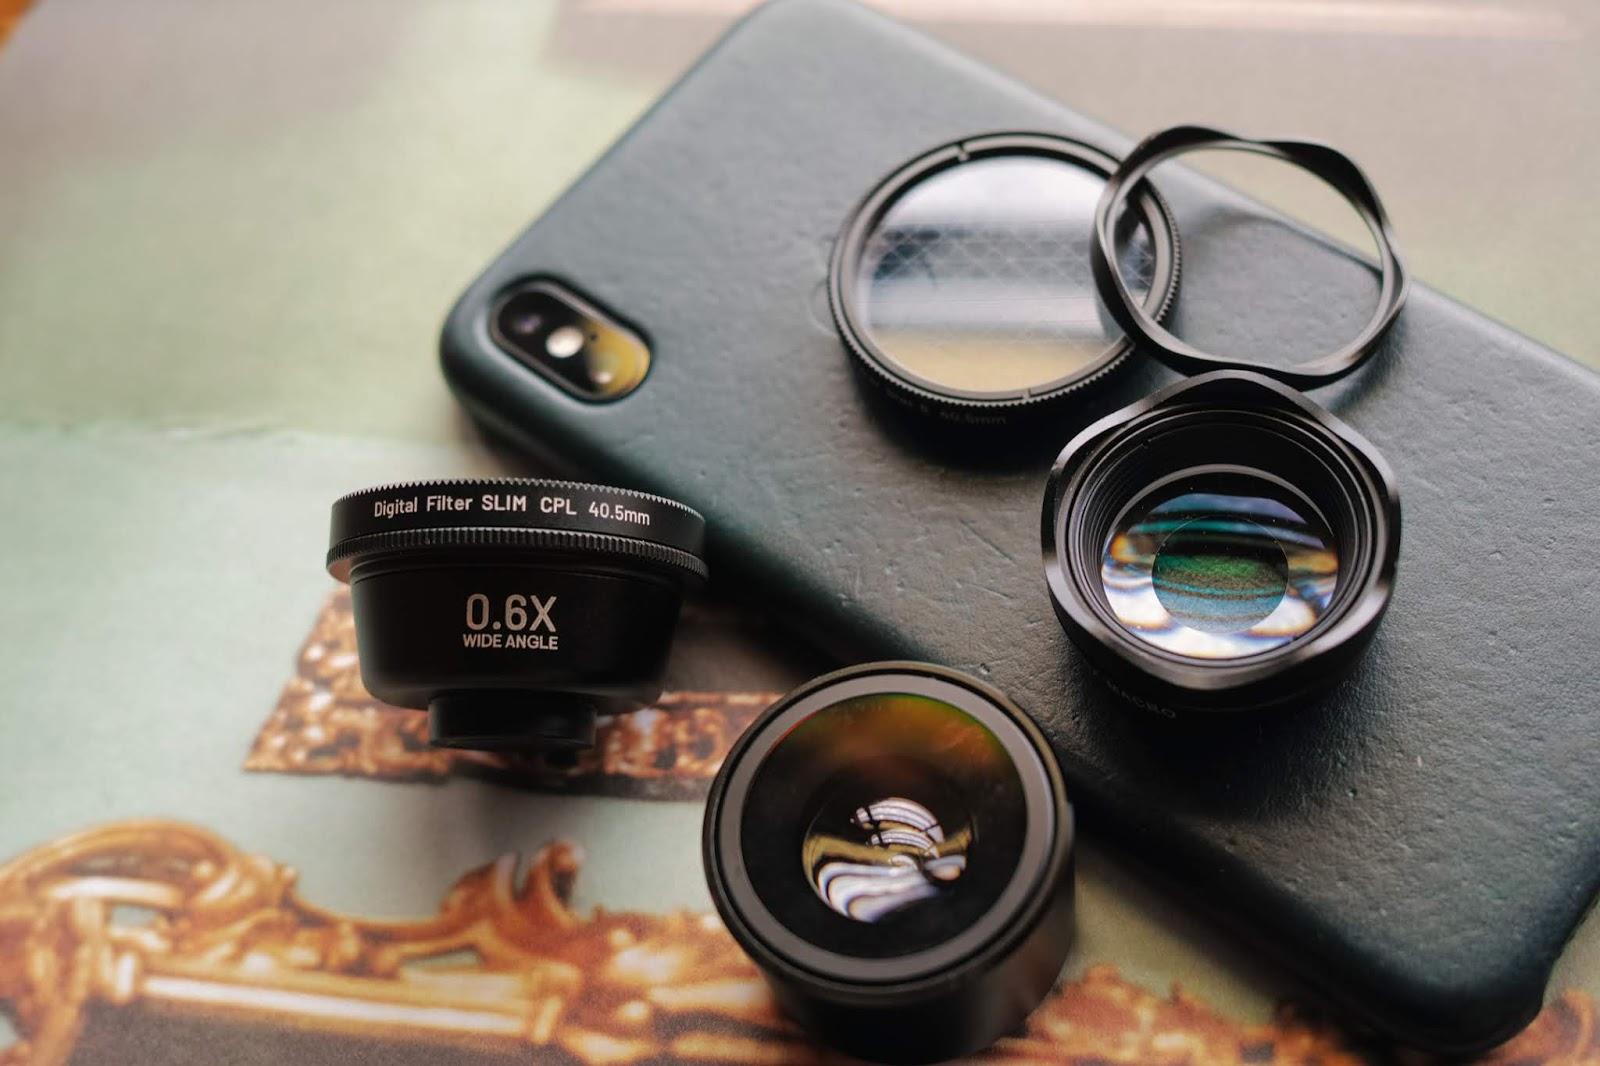 「LIEQI LQ PRO-285 / 頂級款」手機外接鏡頭推薦 | iPhone XS MAX 高畫質拍攝